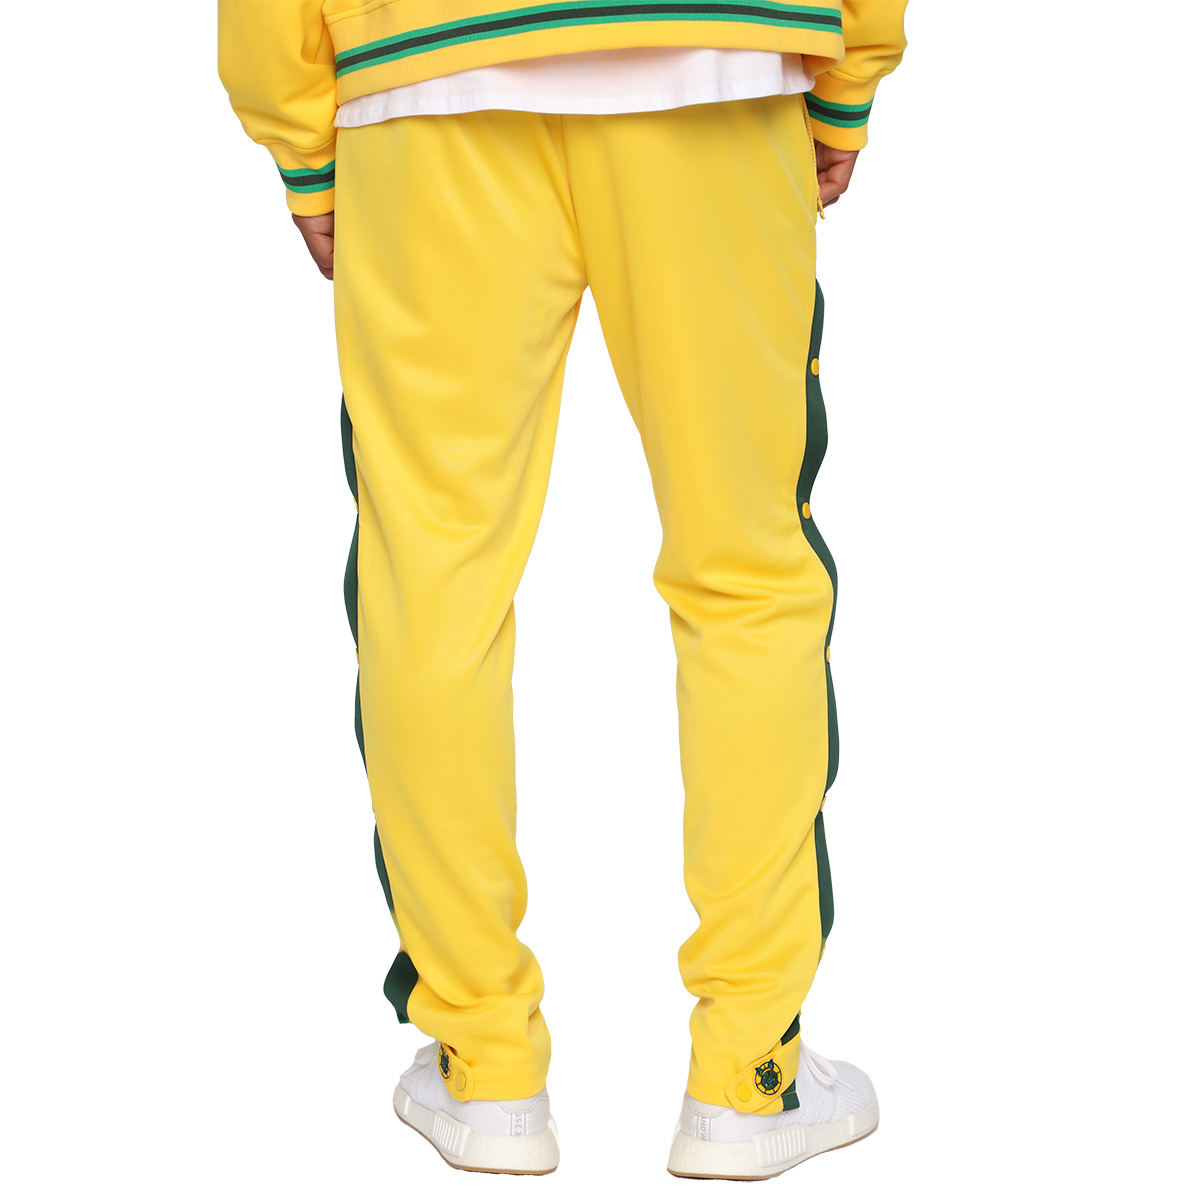 Team Ball Hogs Joggers - Yellow